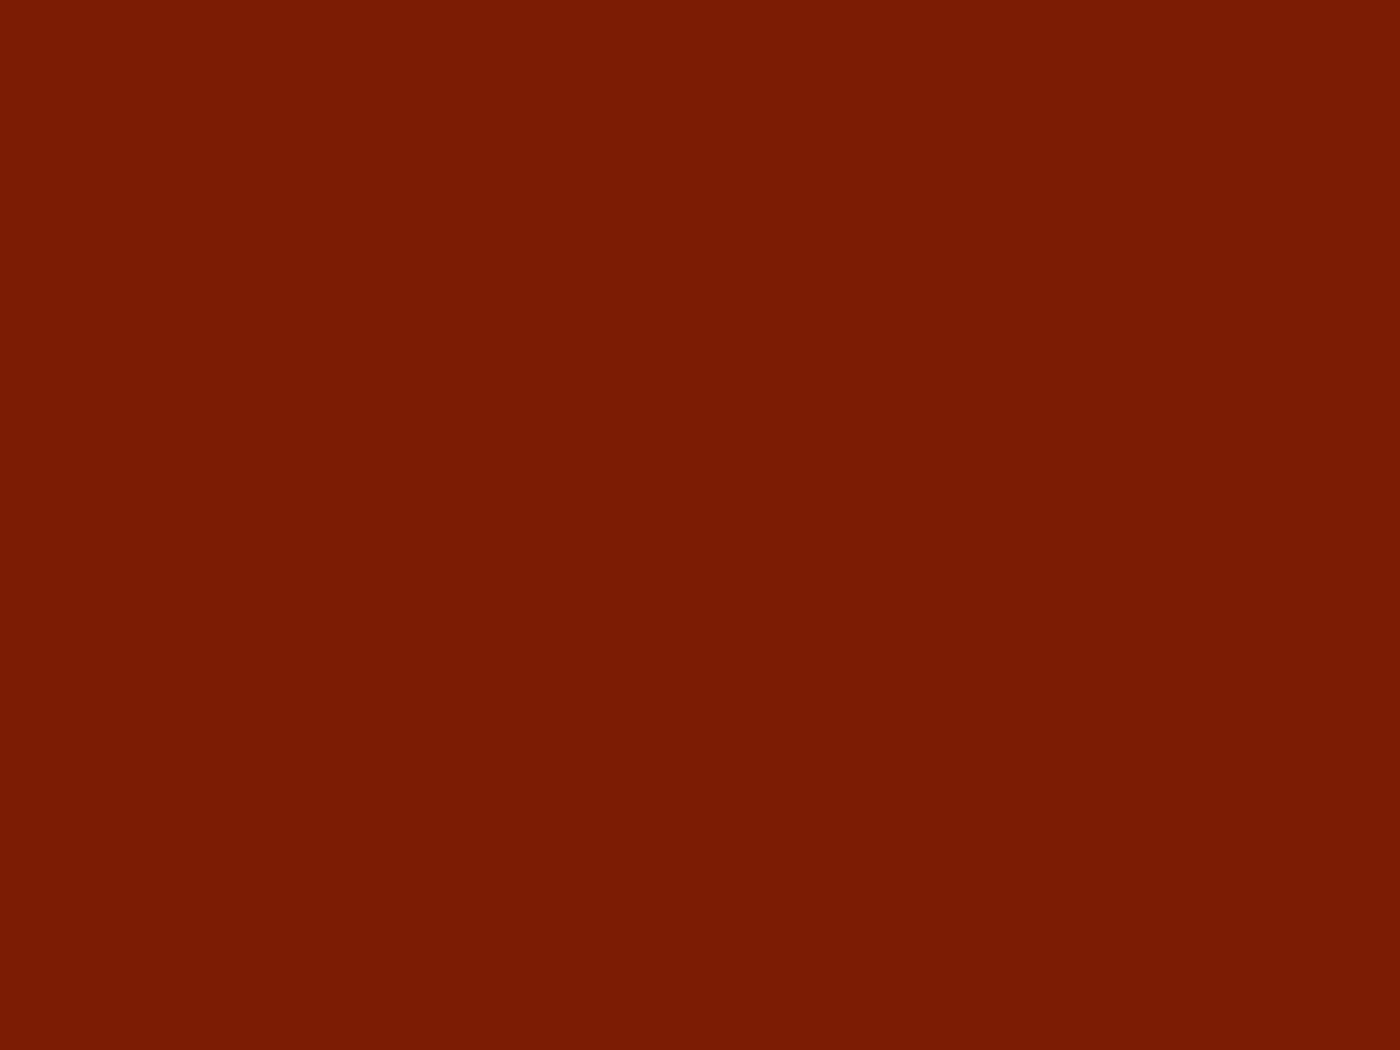 1400x1050 Kenyan Copper Solid Color Background